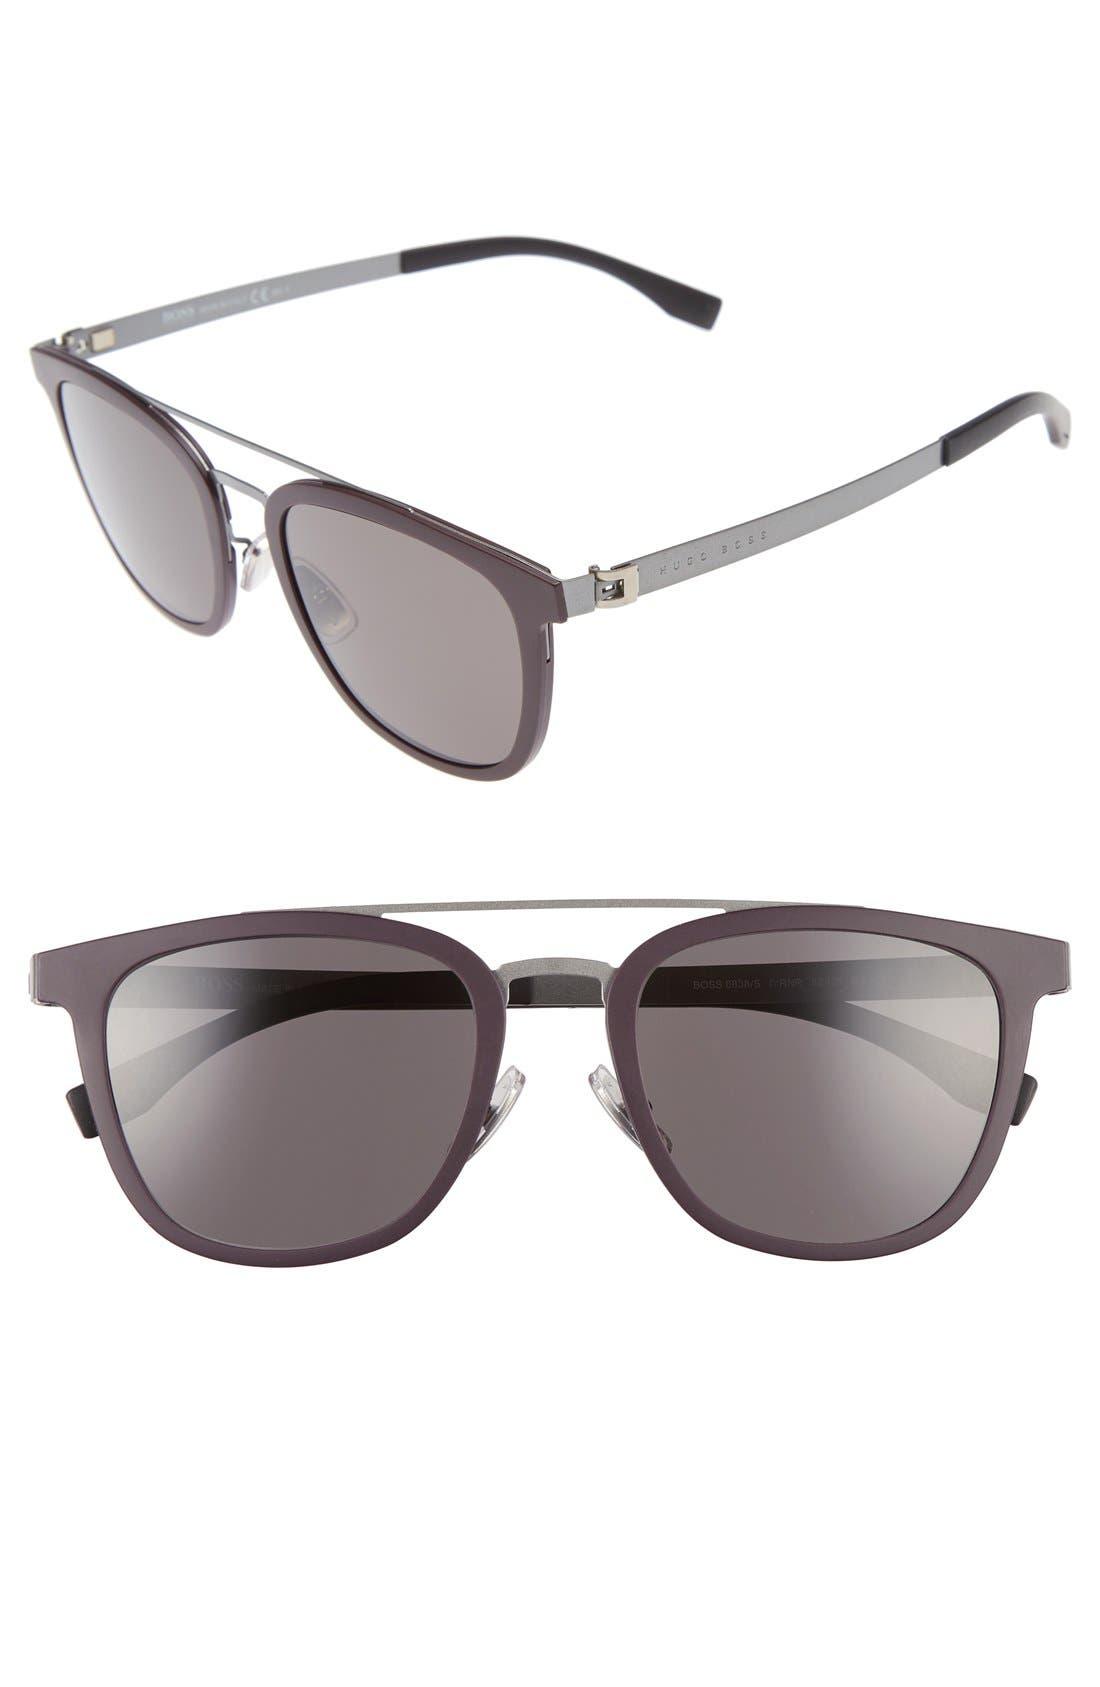 BOSS 838/S 52mm Sunglasses